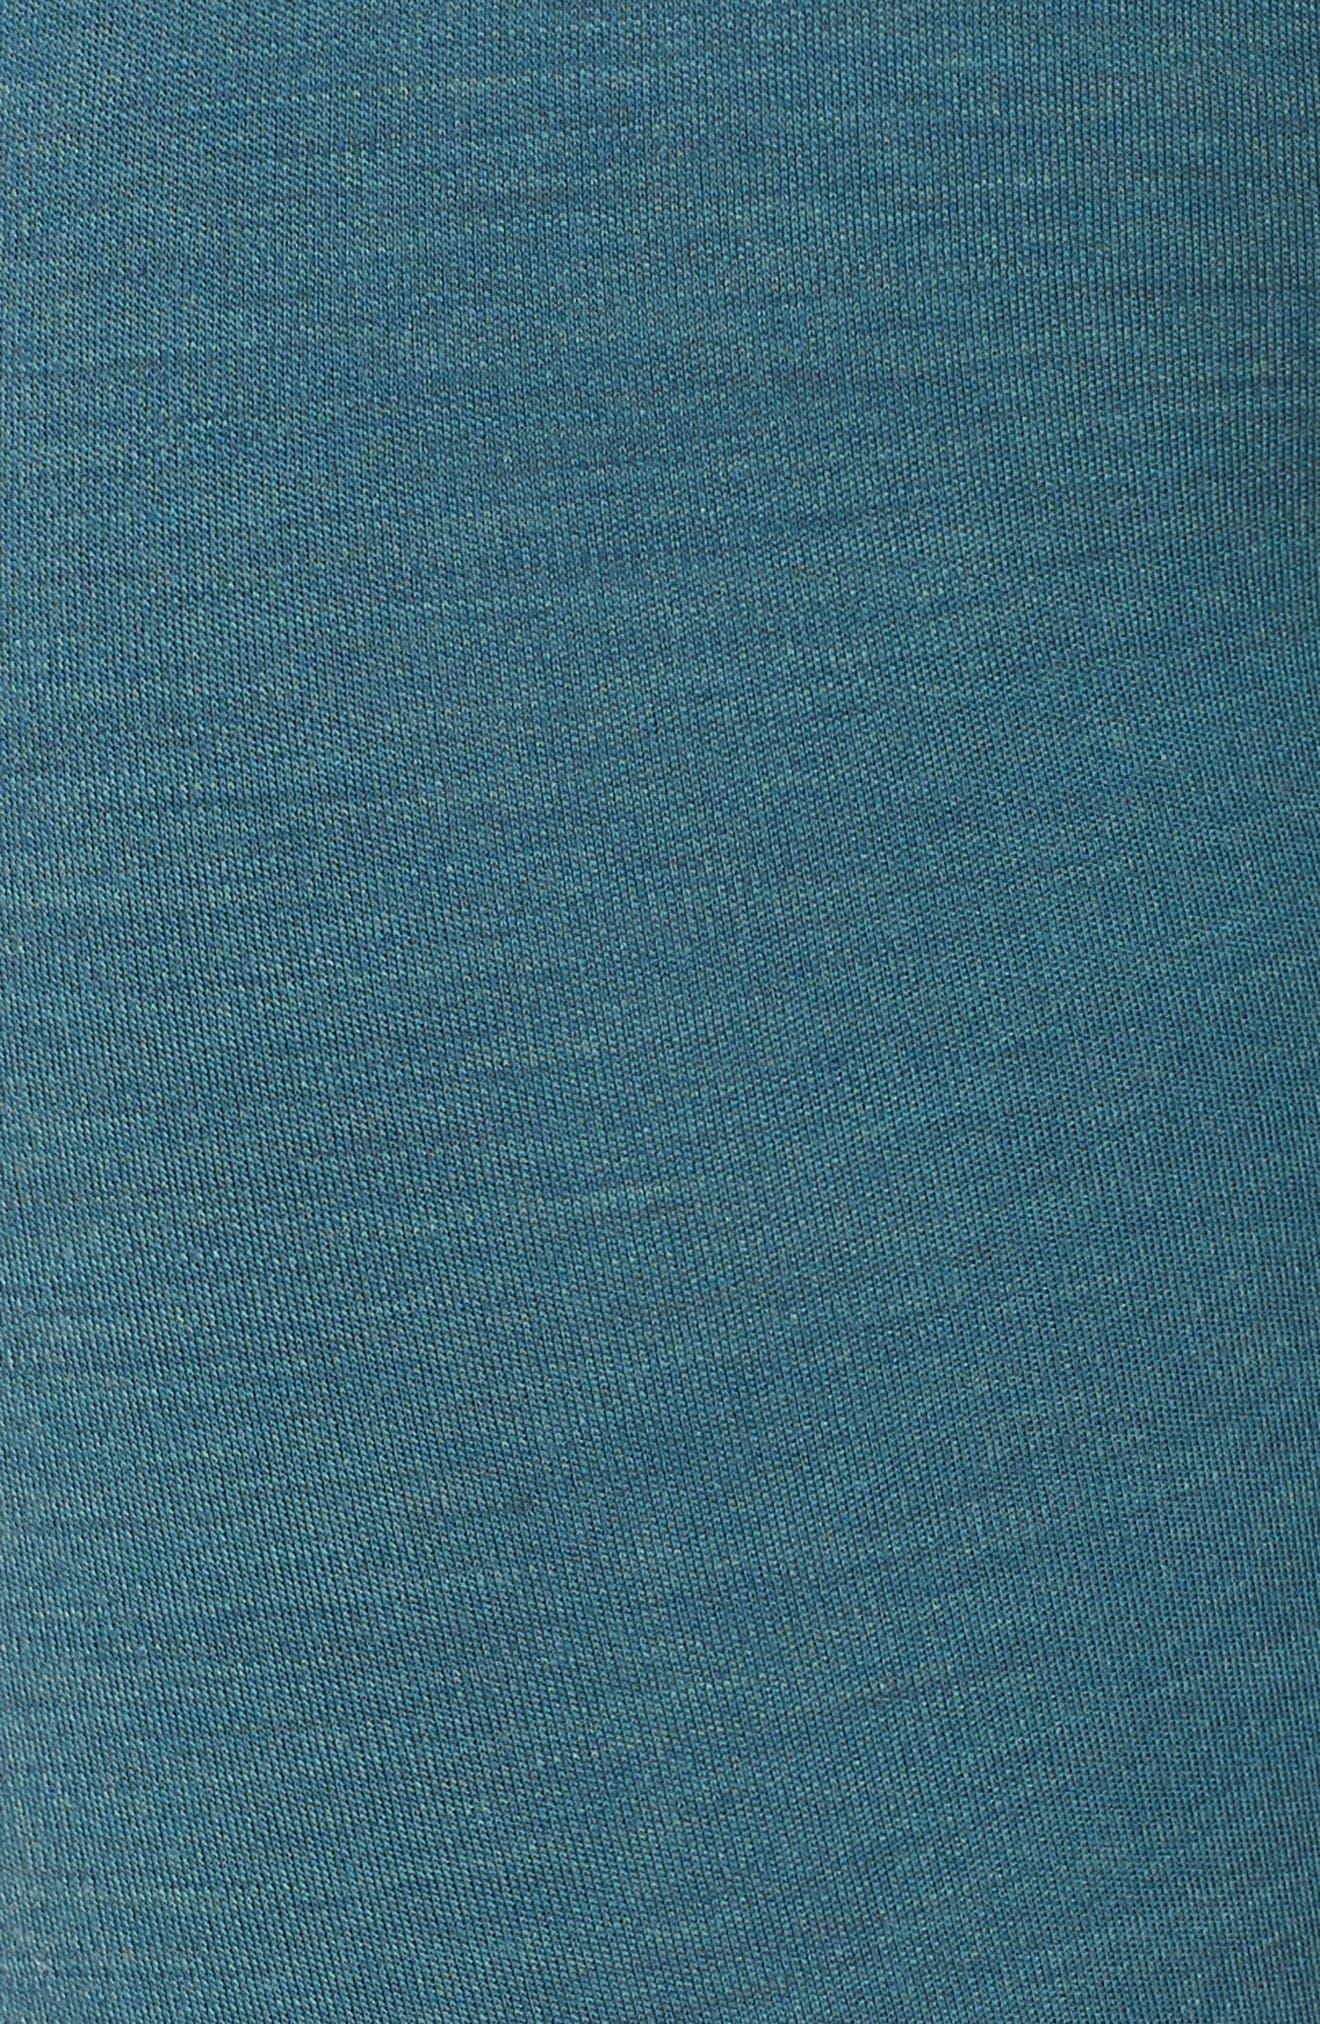 Merino 250 Active Leggings,                             Alternate thumbnail 6, color,                             MEDITERRANEAN GREEN